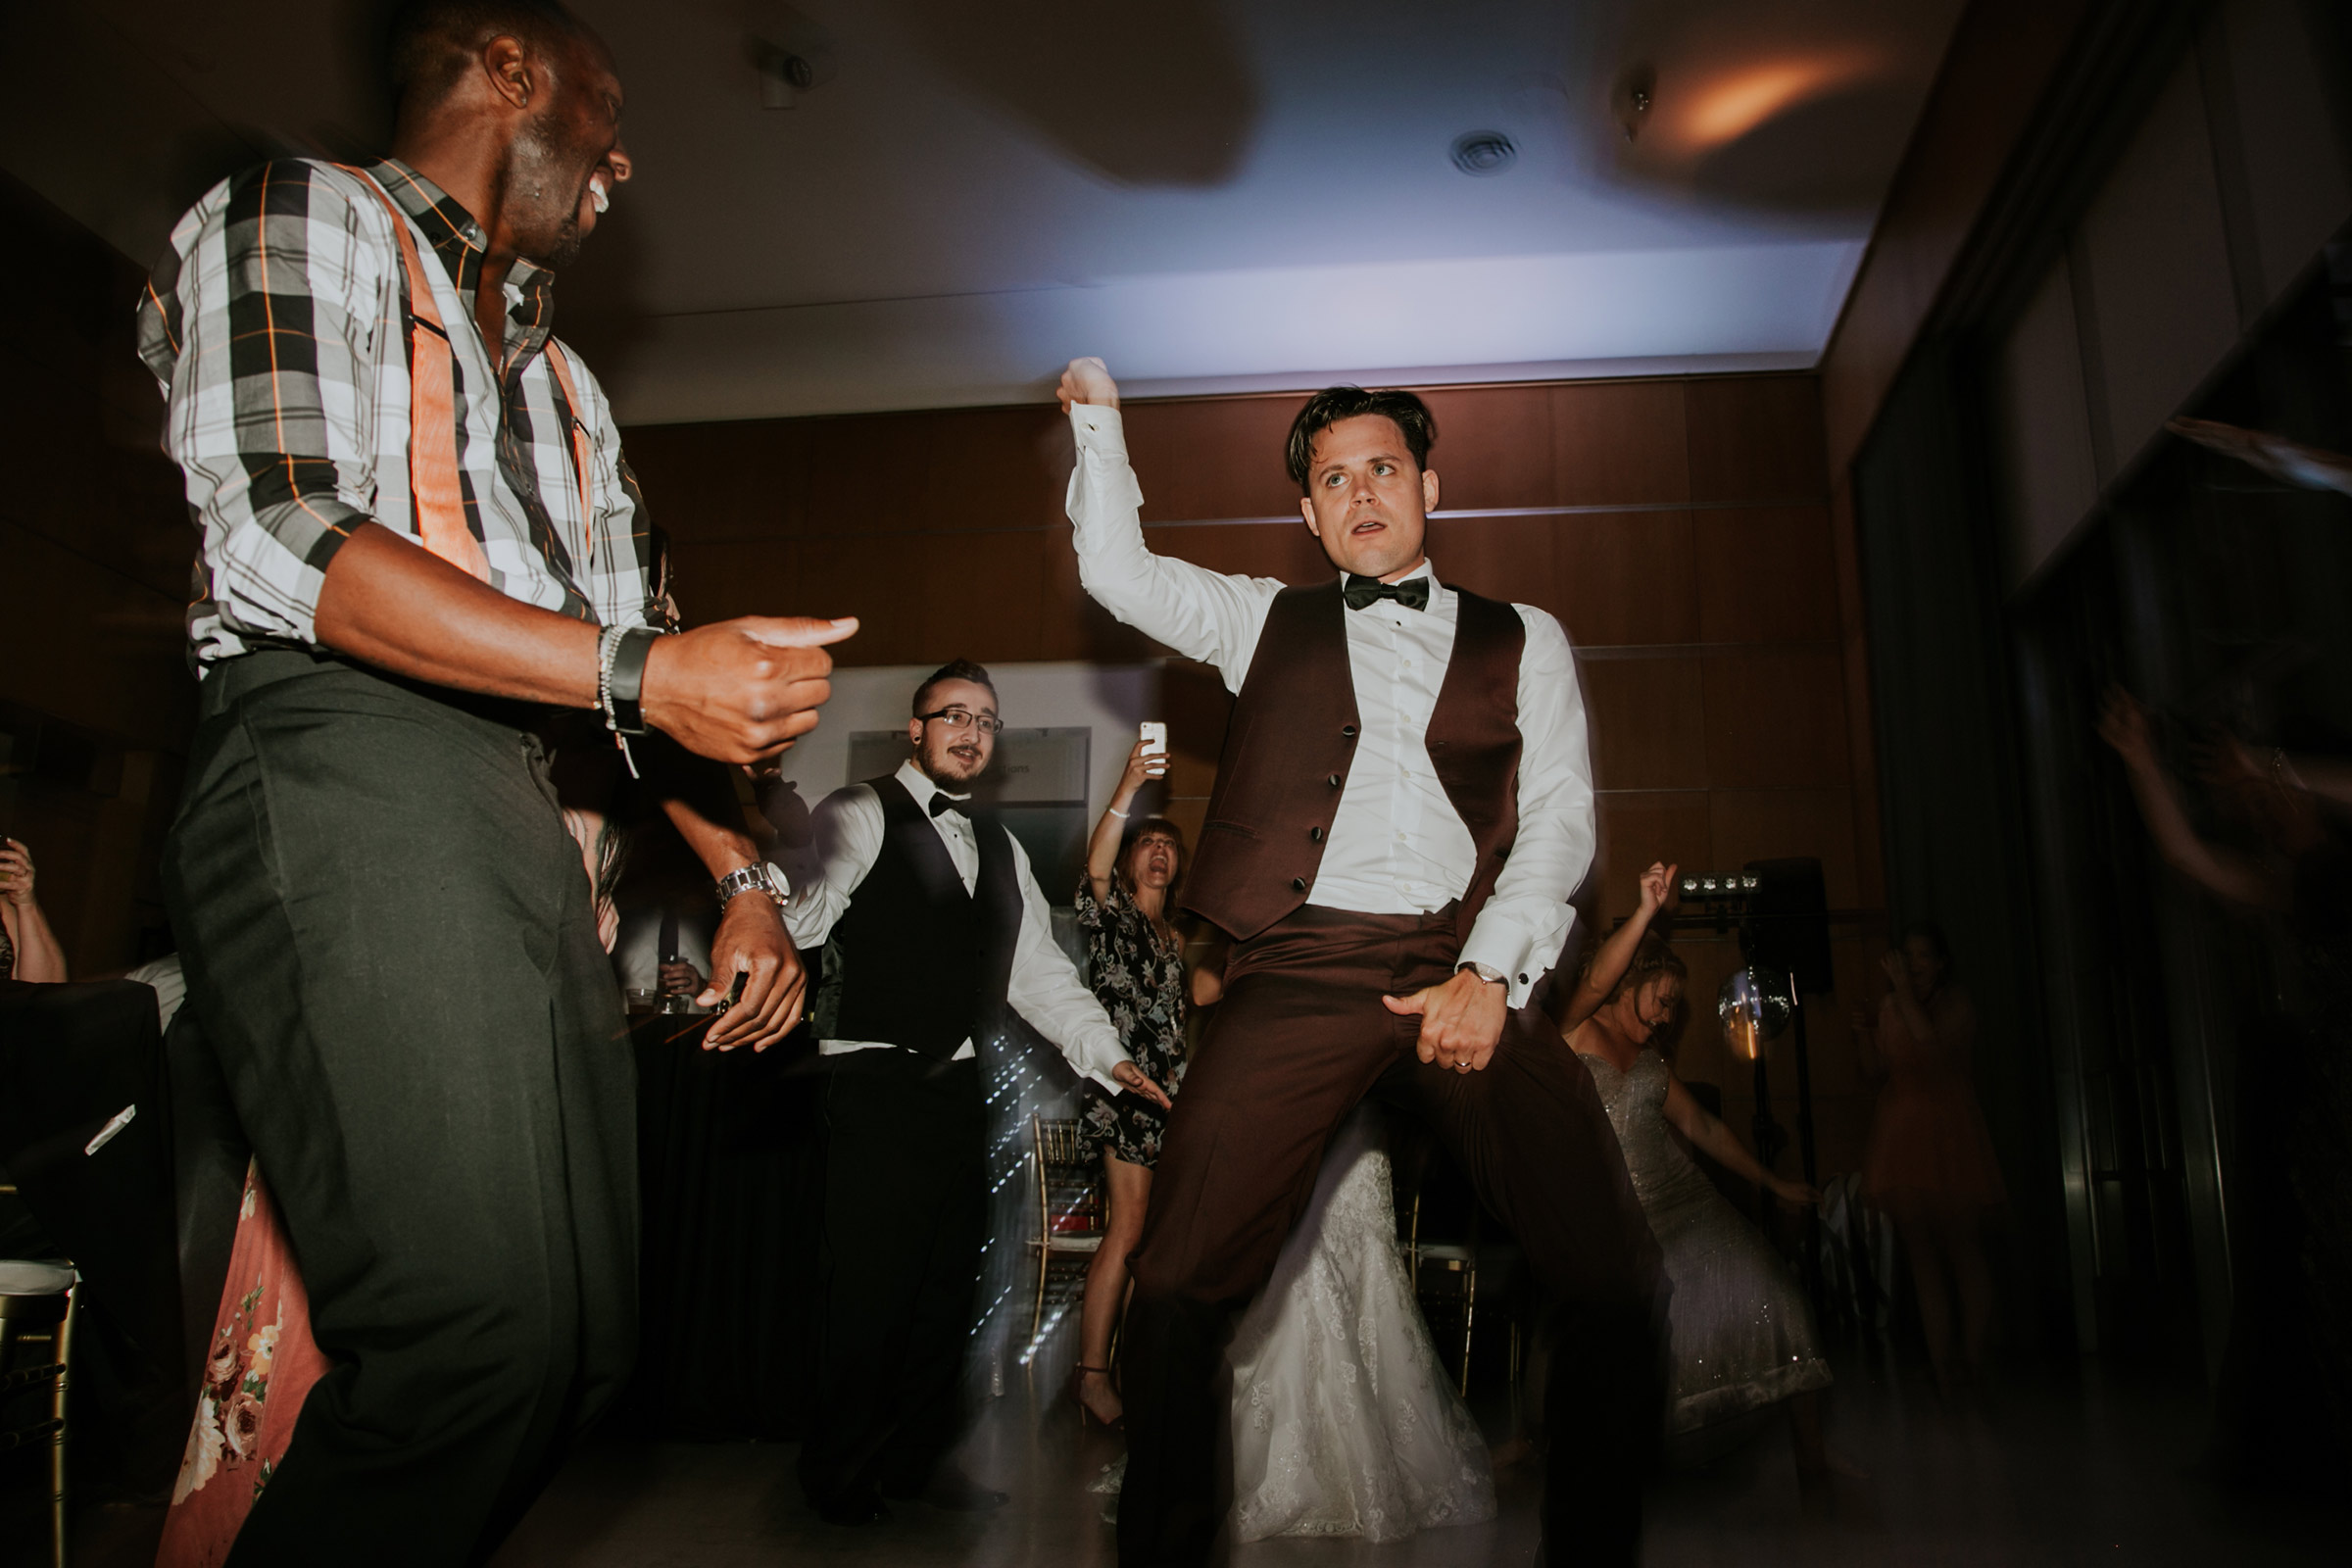 groom-dancing-on-the-dance-floor-after-hours-desmoines-iowa-art-center-raelyn-ramey-photography.jpg